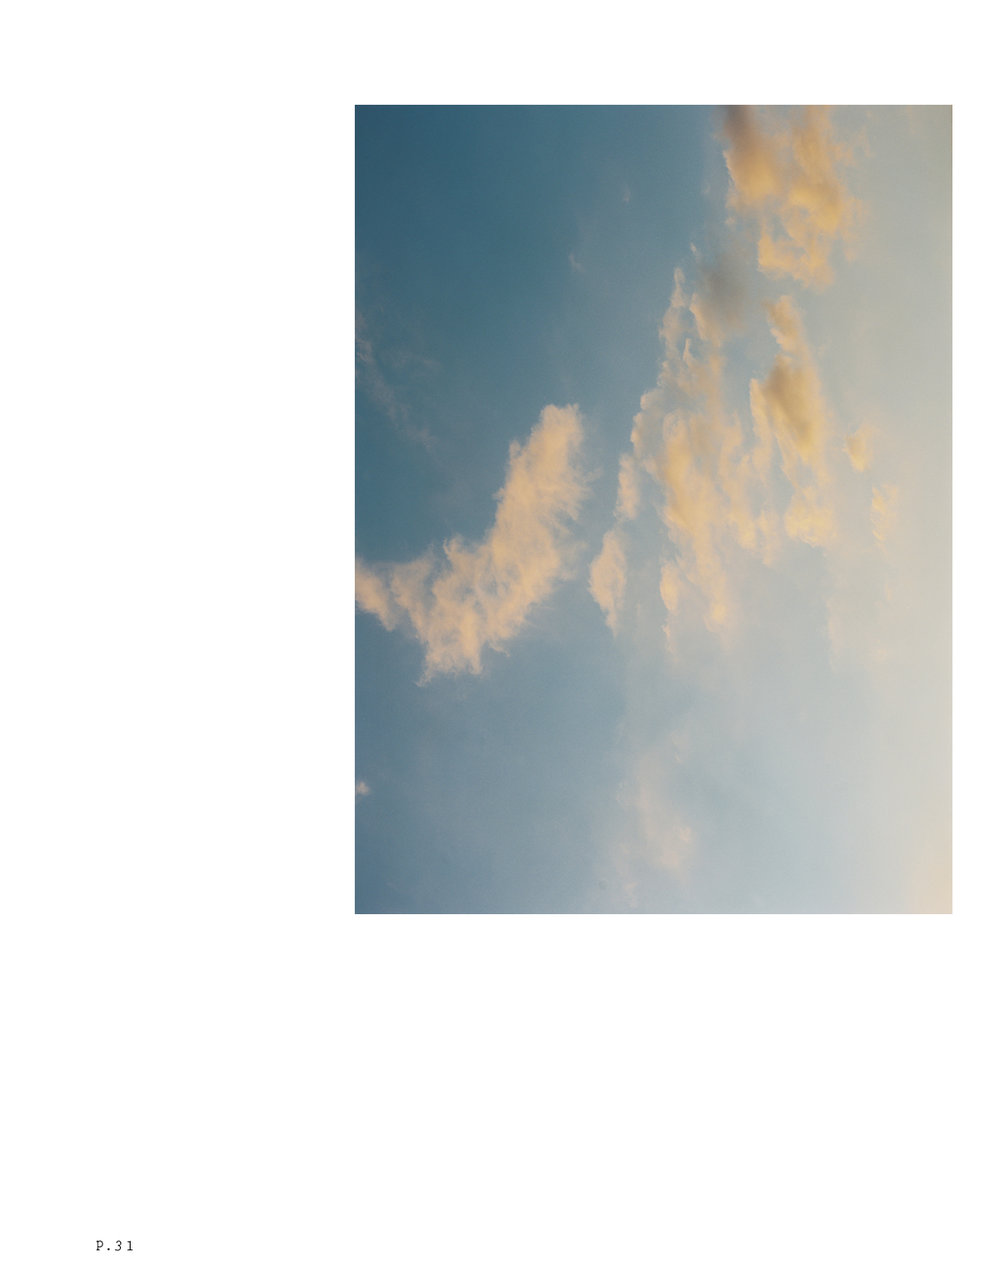 007_Toogood_Collection_Book_DIGITAL_LoRES31.jpg